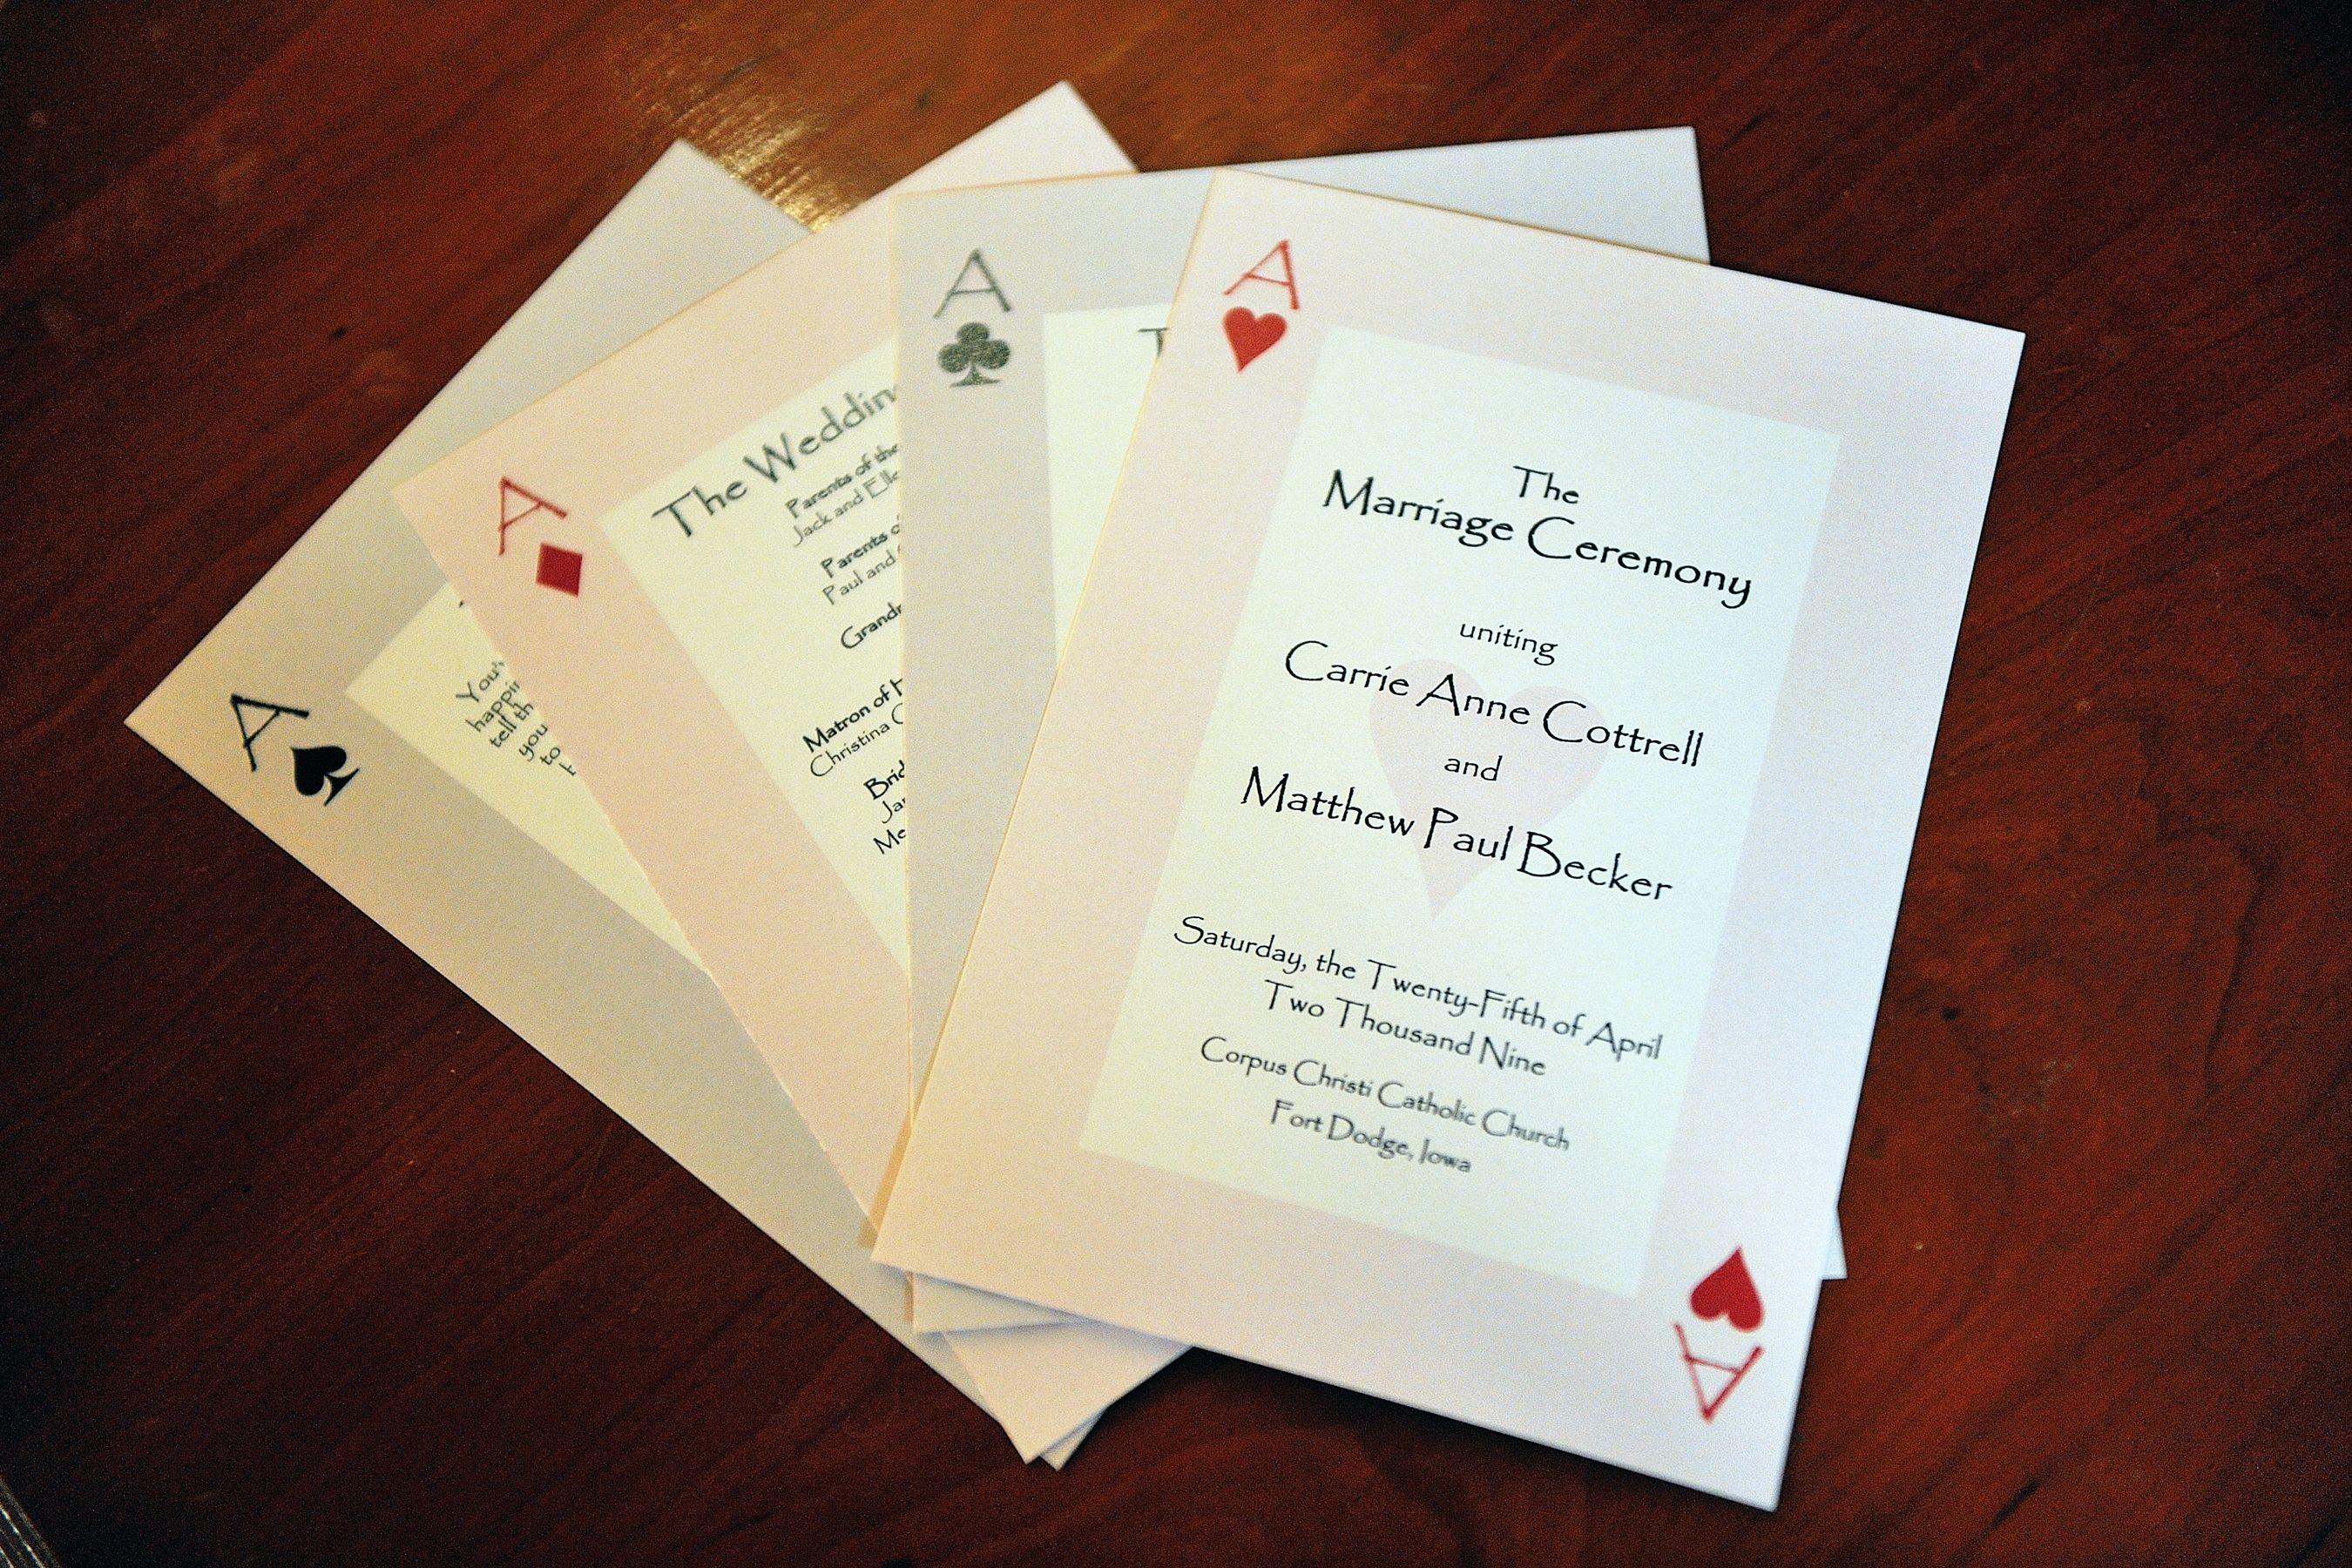 Las Vegas themed wedding program | Arts & Crafts | Pinterest | Vegas ...